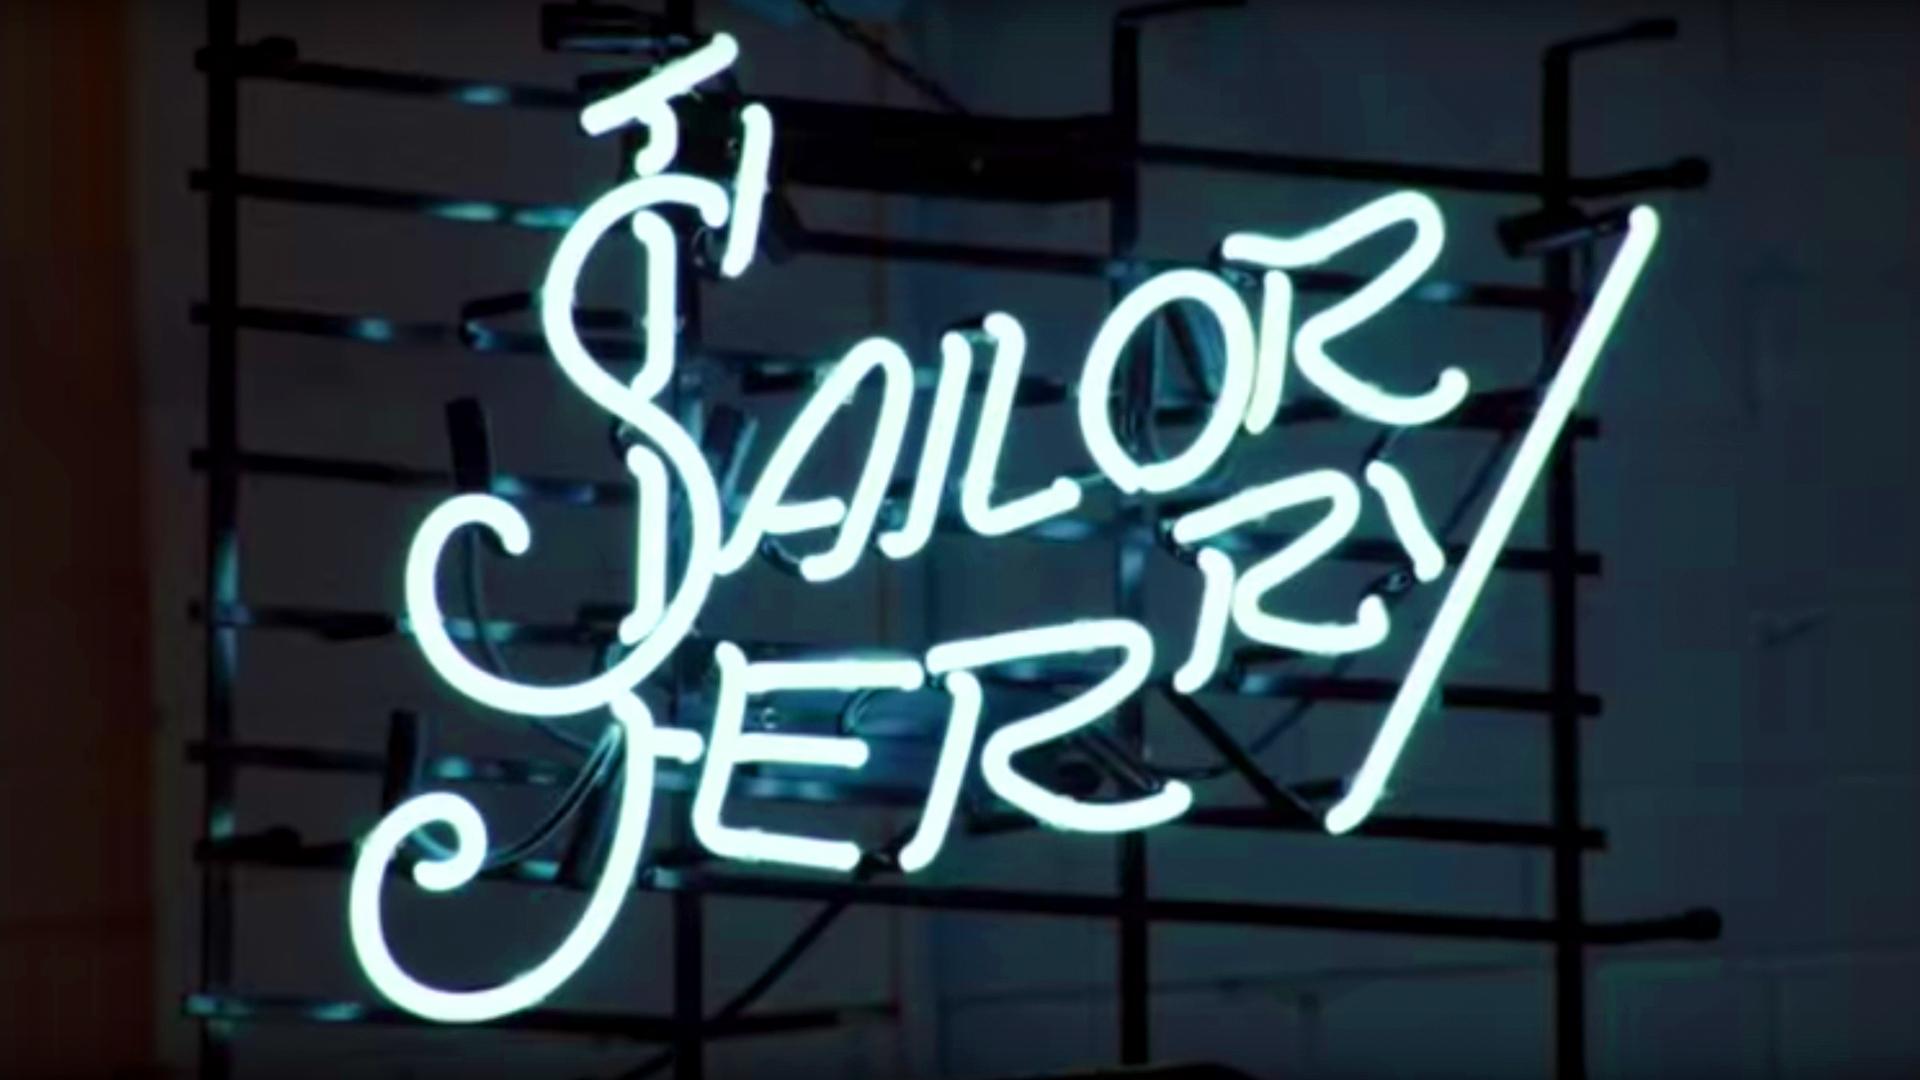 SailorJerry1